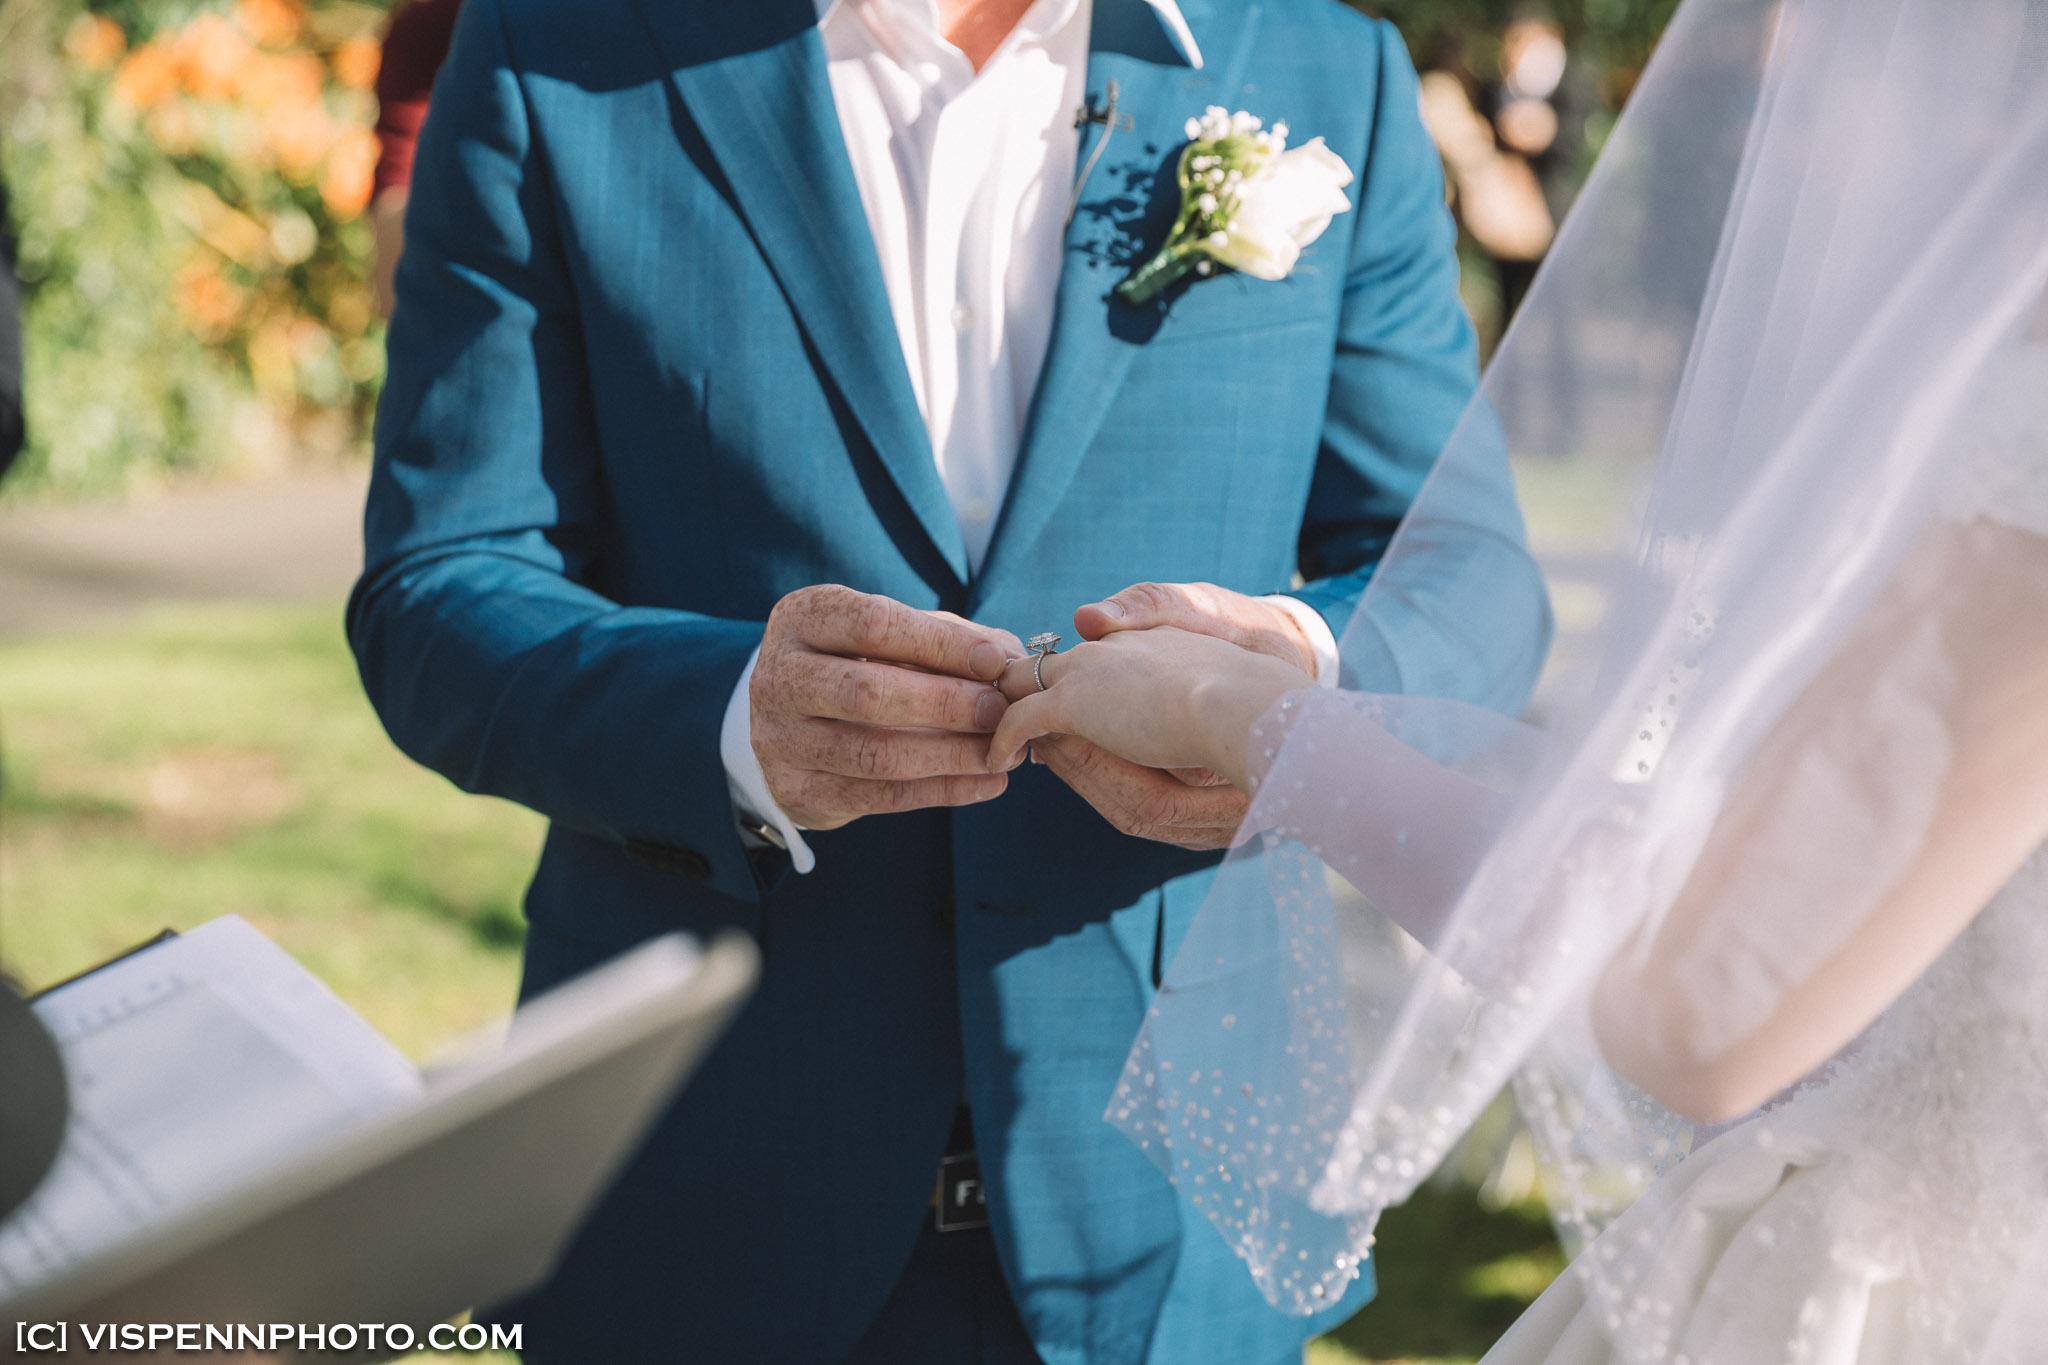 WEDDING DAY Photography Melbourne ZHPENN 1P 1DX 01221